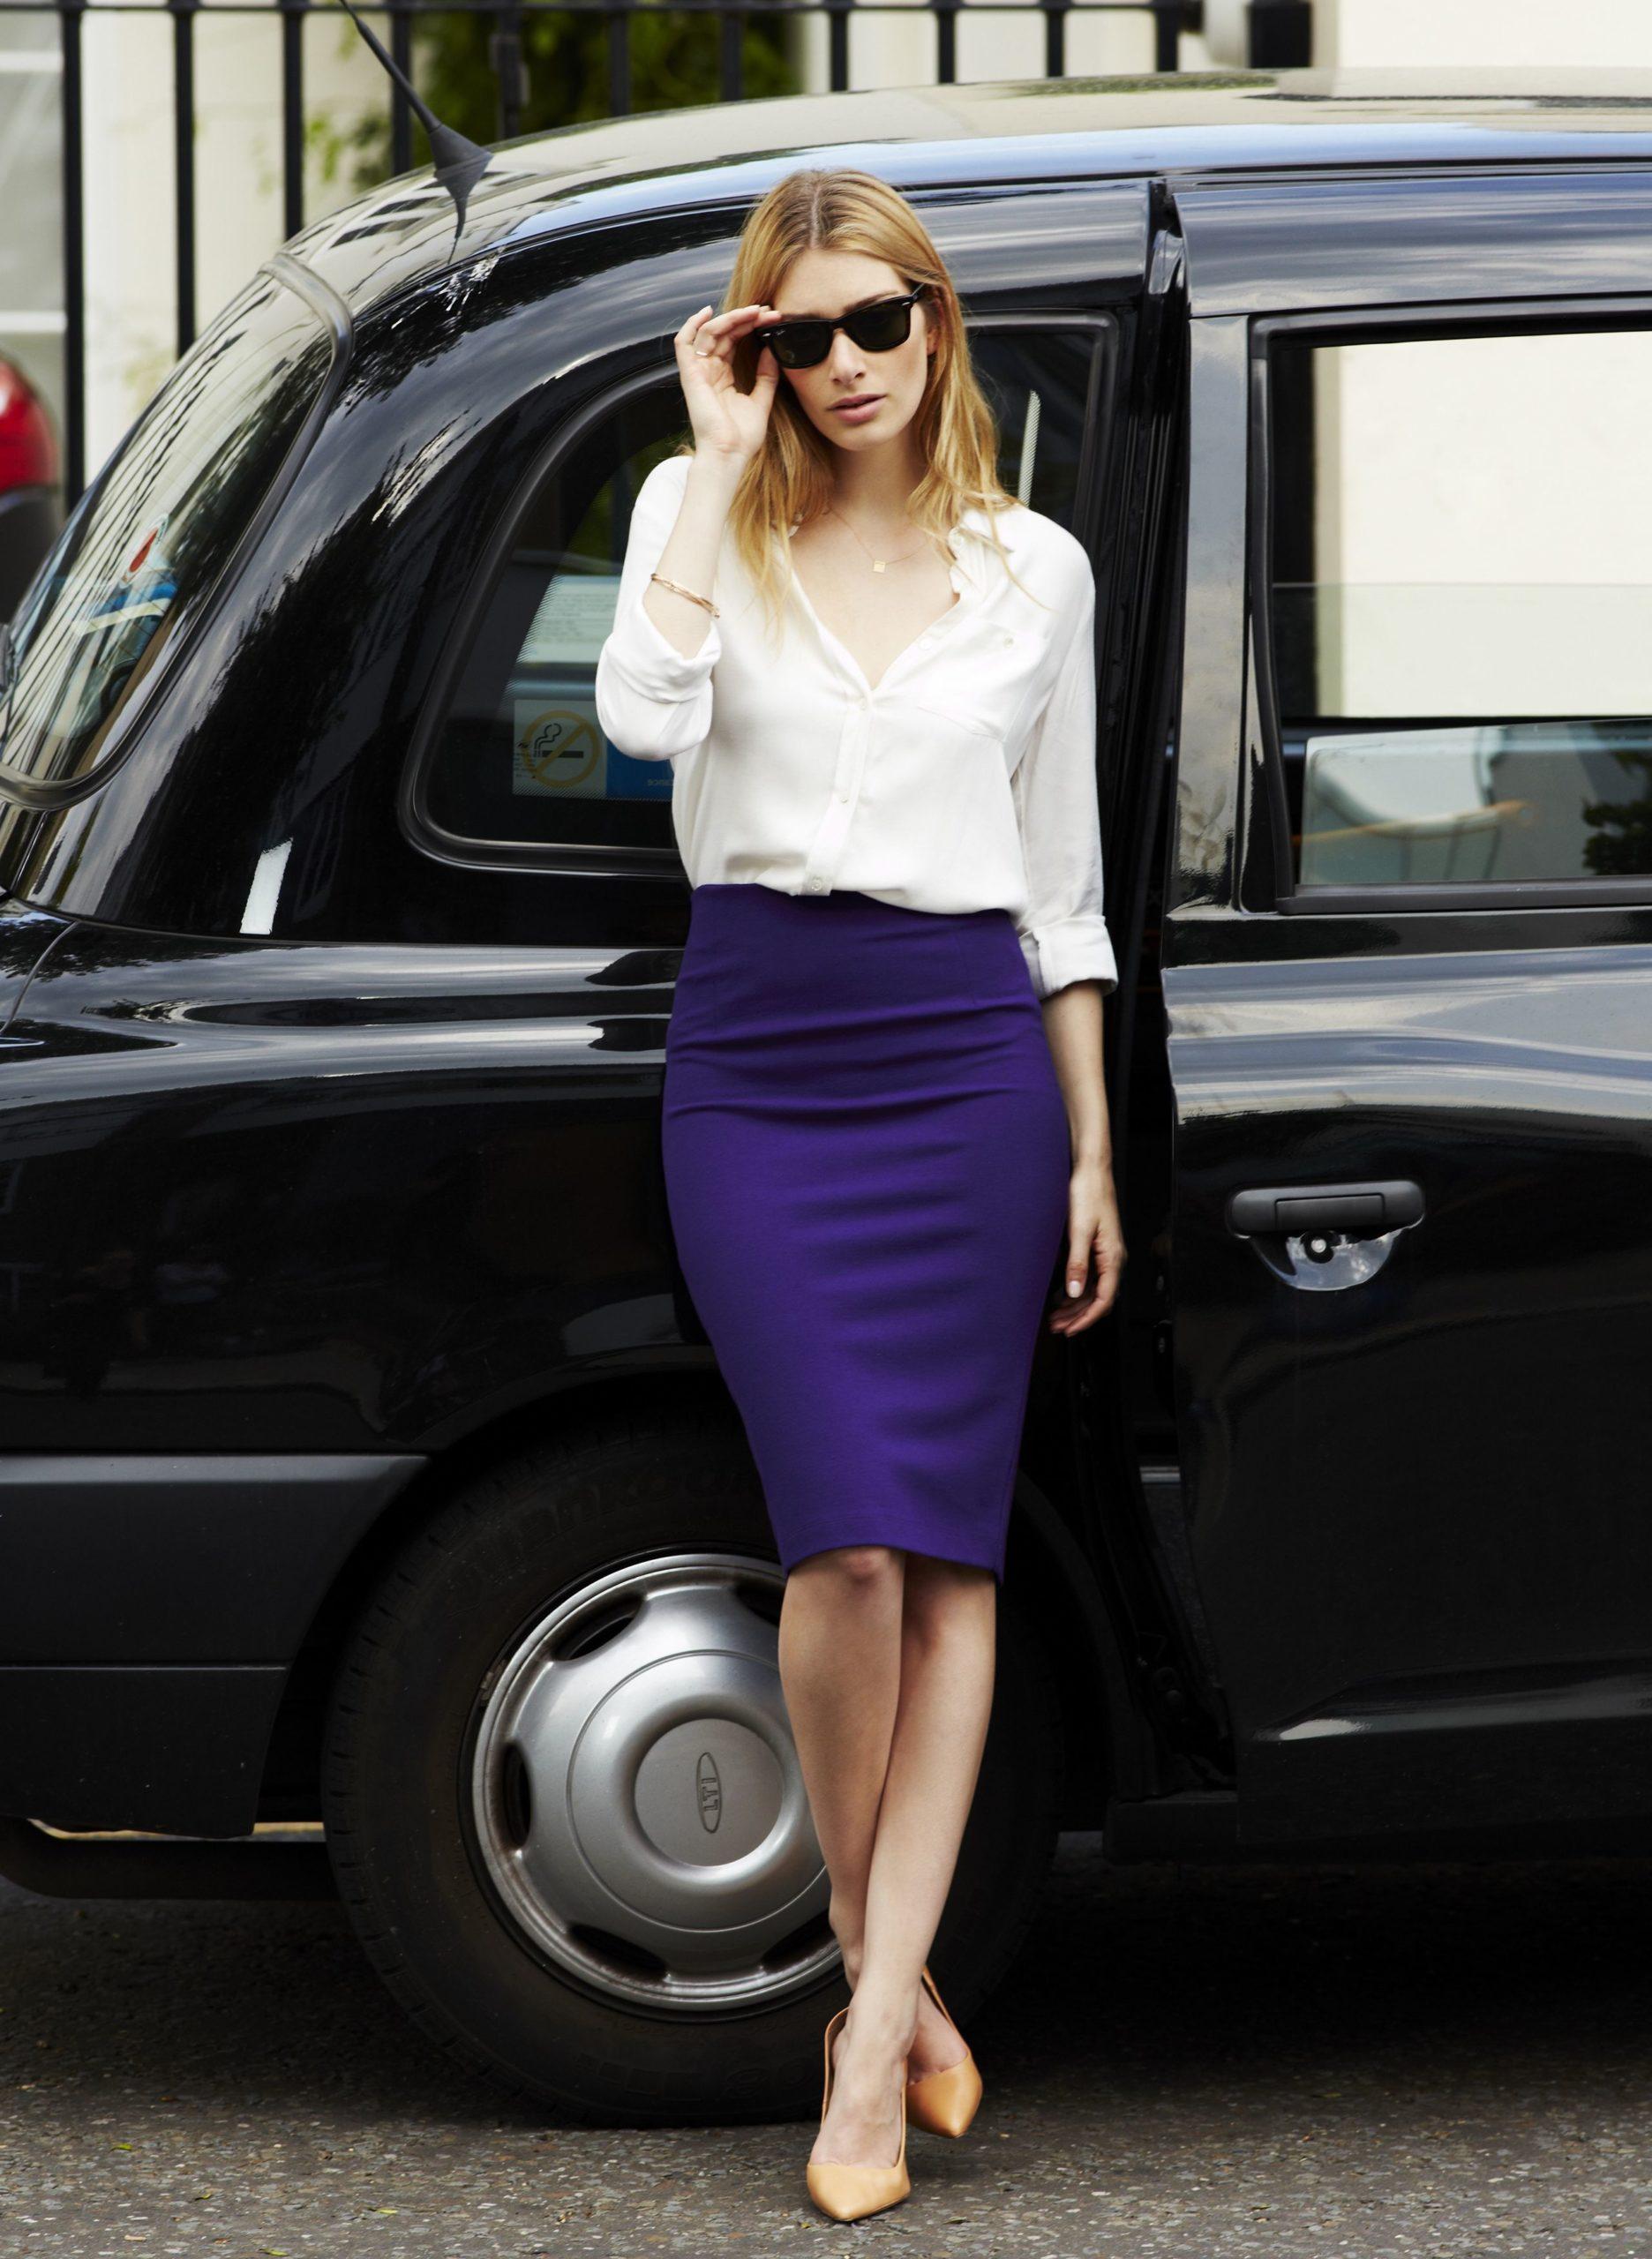 High-Waisted Tube Skirt with Masculine Shirt